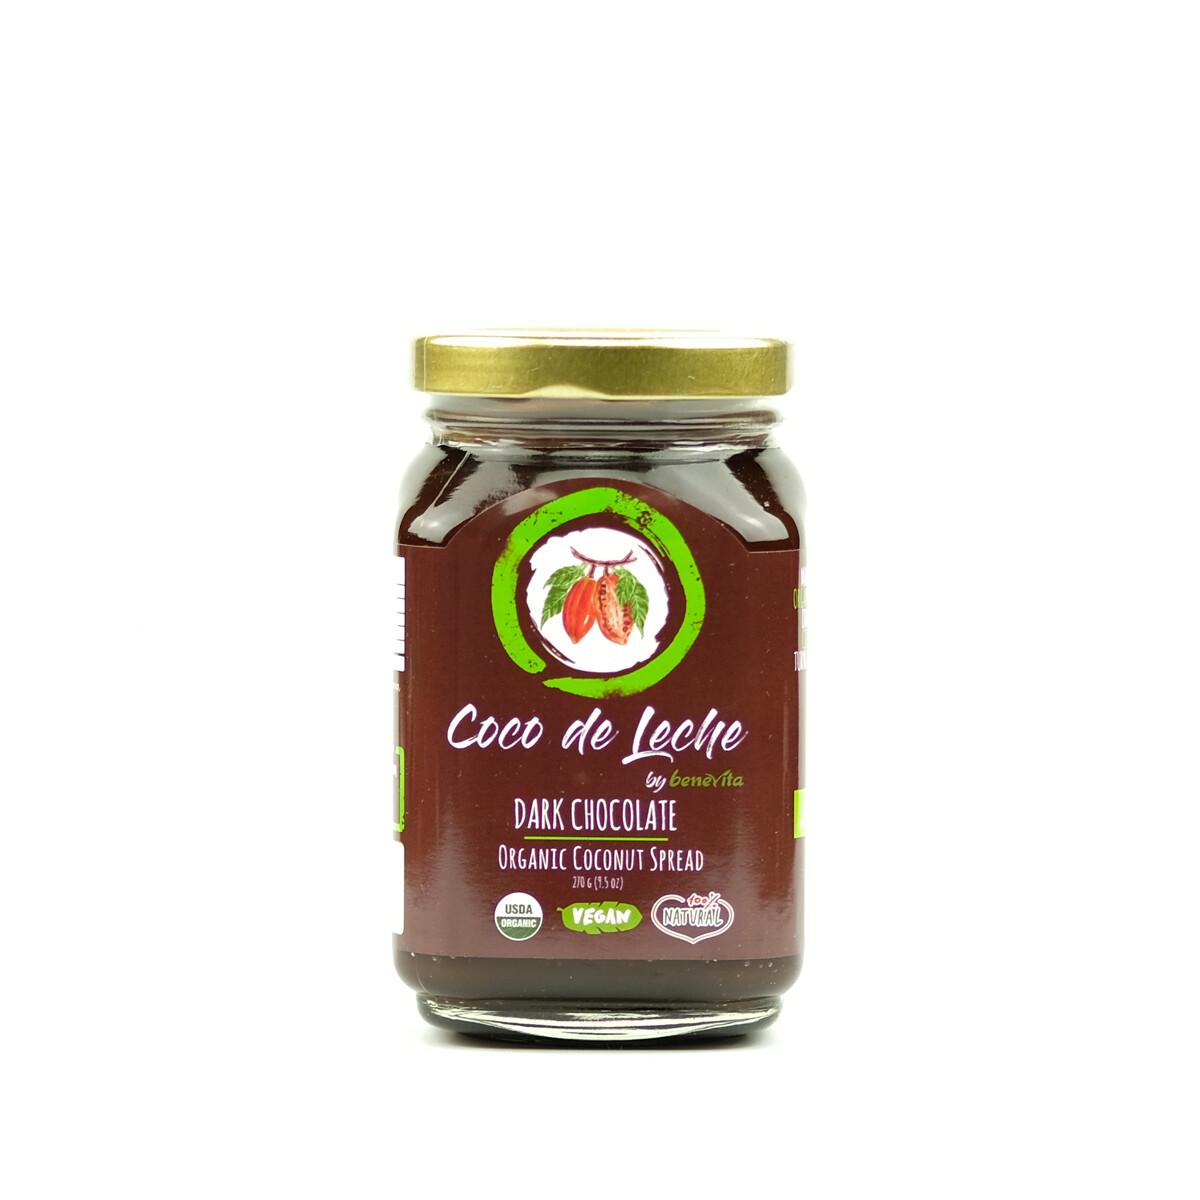 Benevita Organic Coconut Spread Milk Chocolate